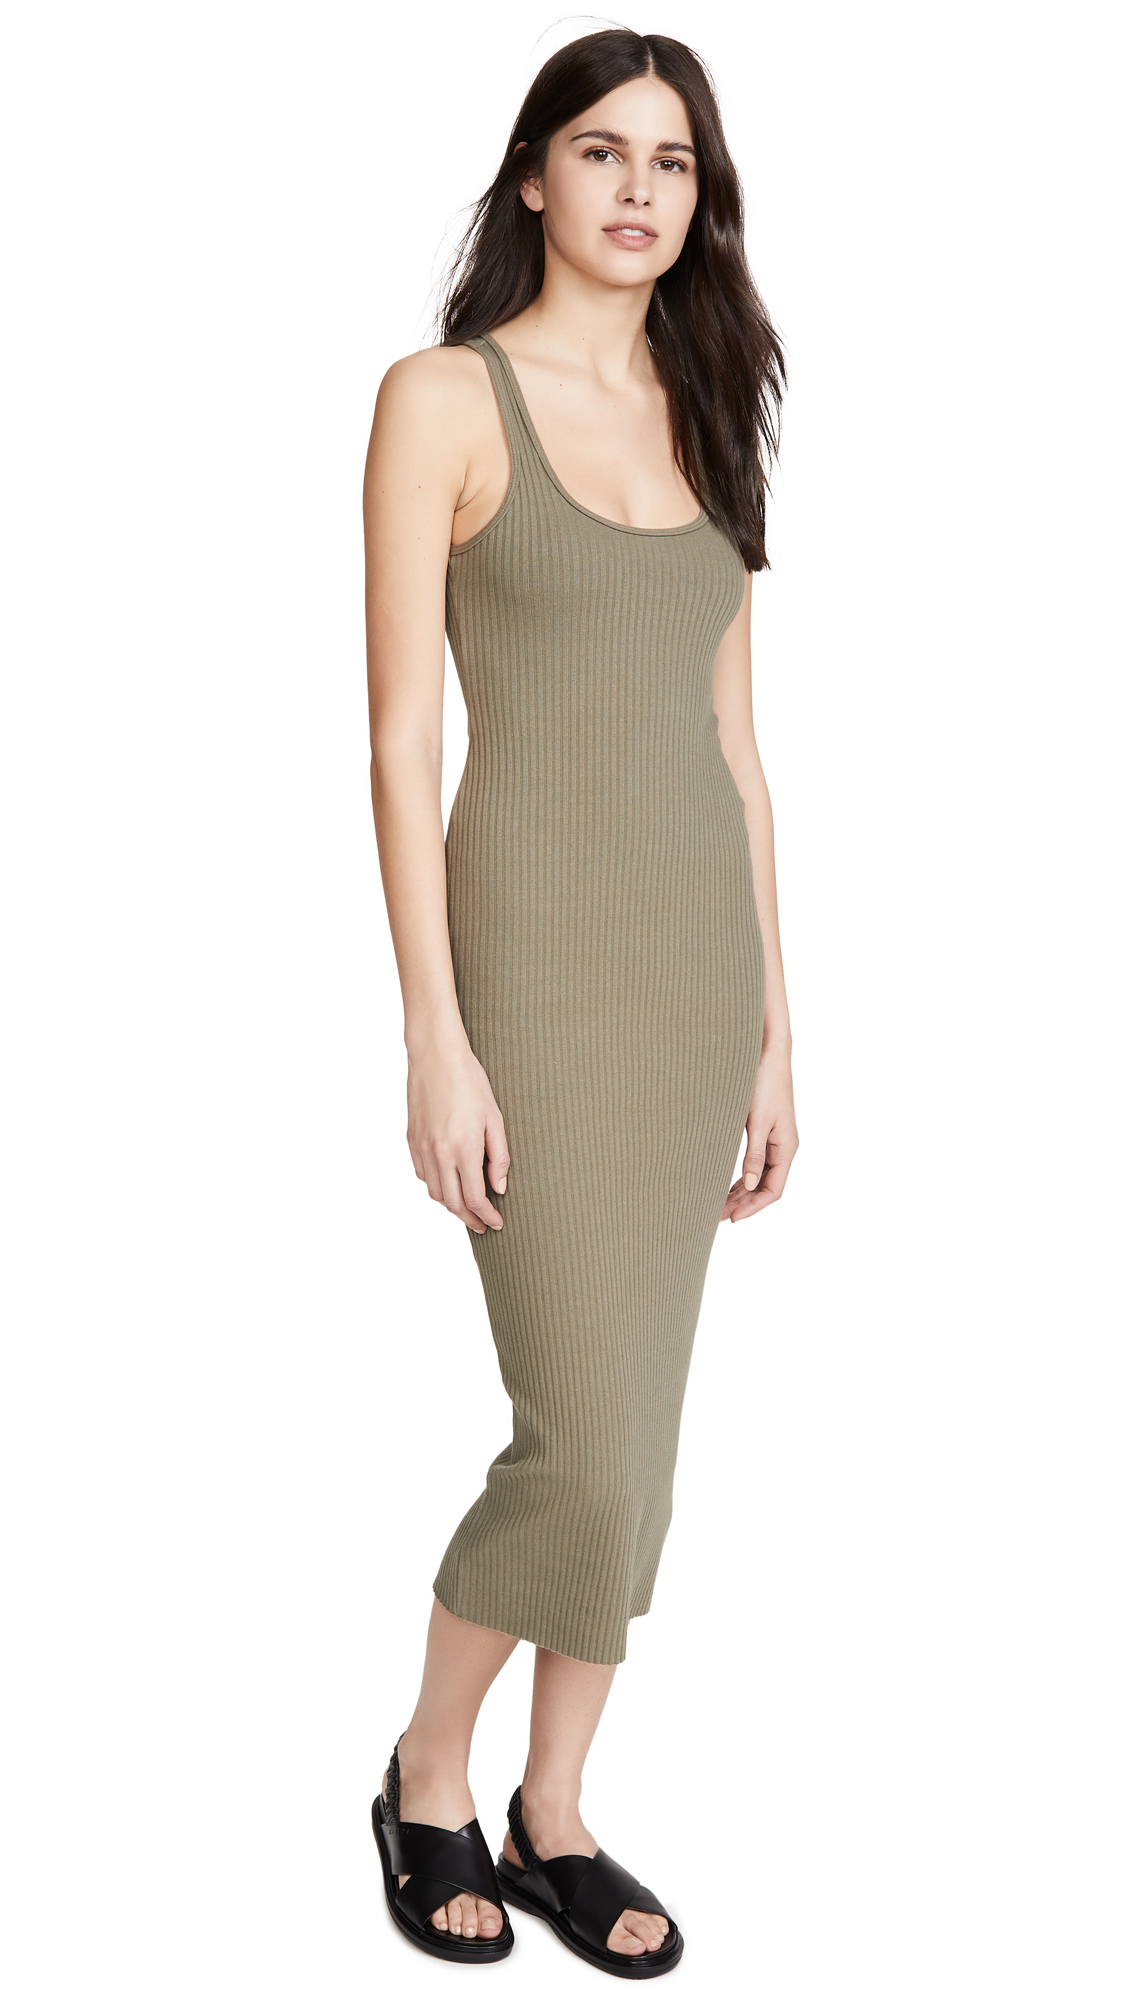 The Range Vital Rib Utilitarian Tank Dress - 30% Off Sale